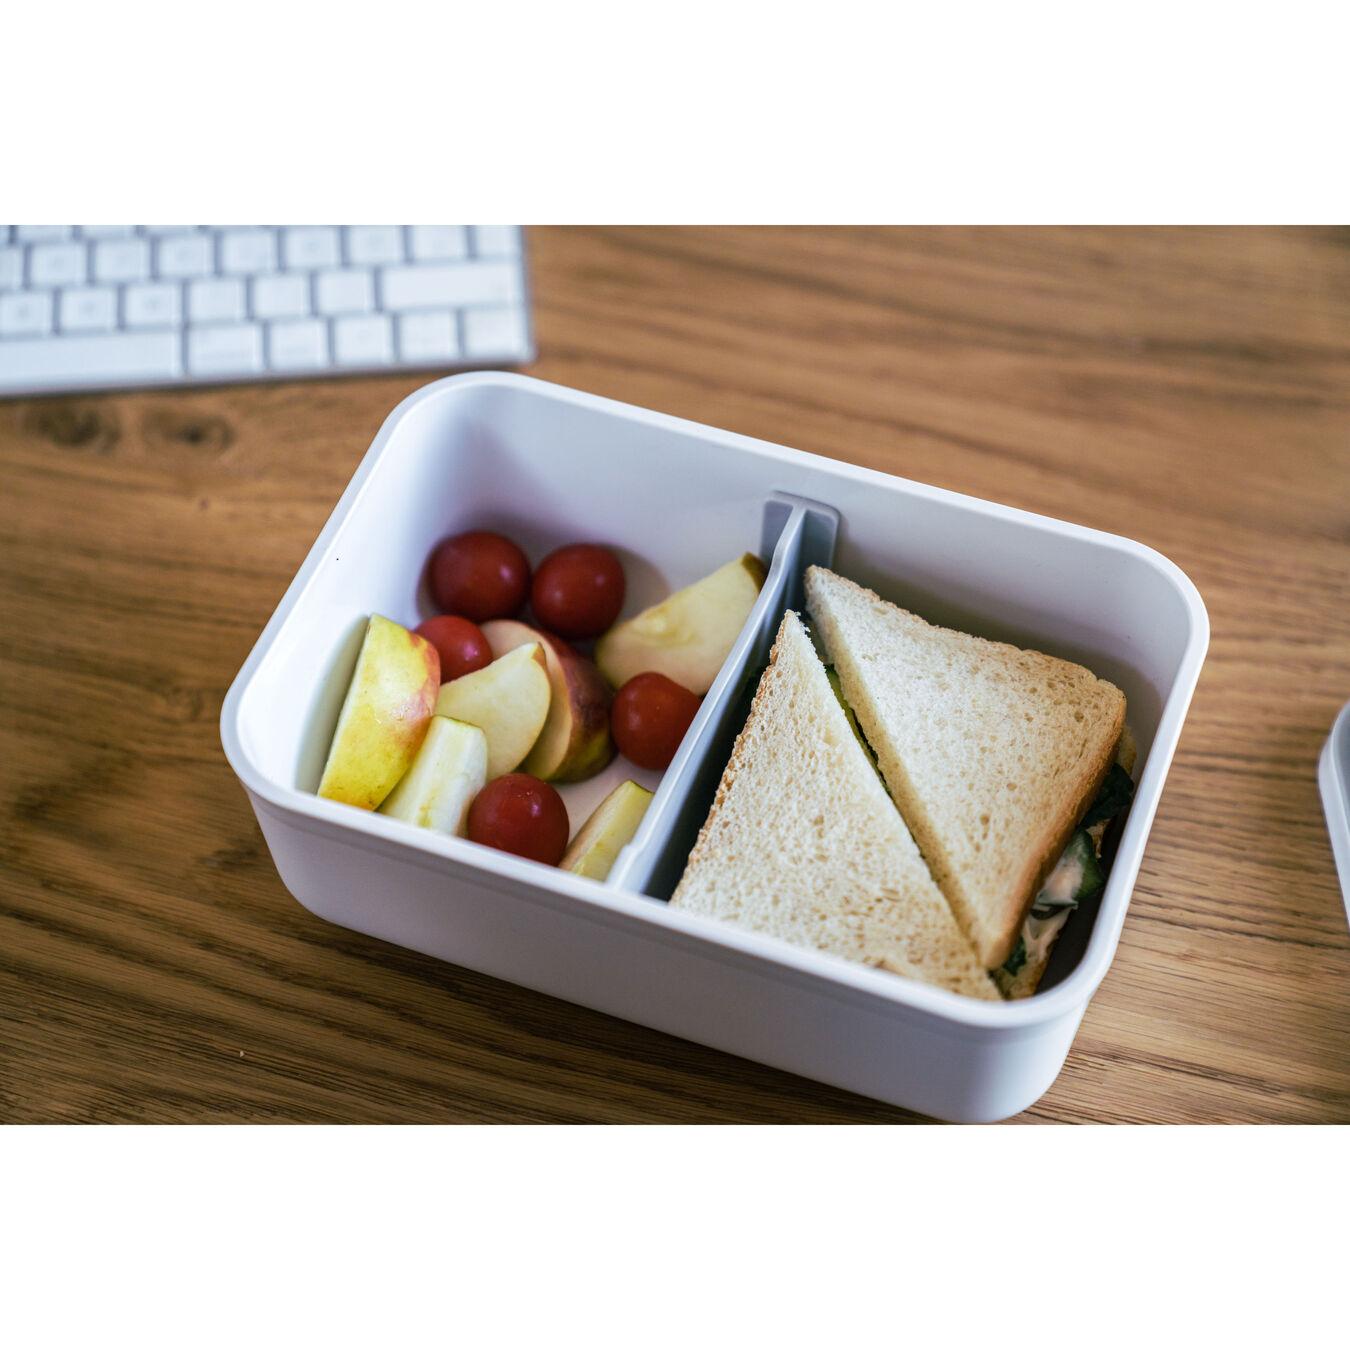 Vakuum Lunchbox, L, Kunststoff, Weiß,,large 6